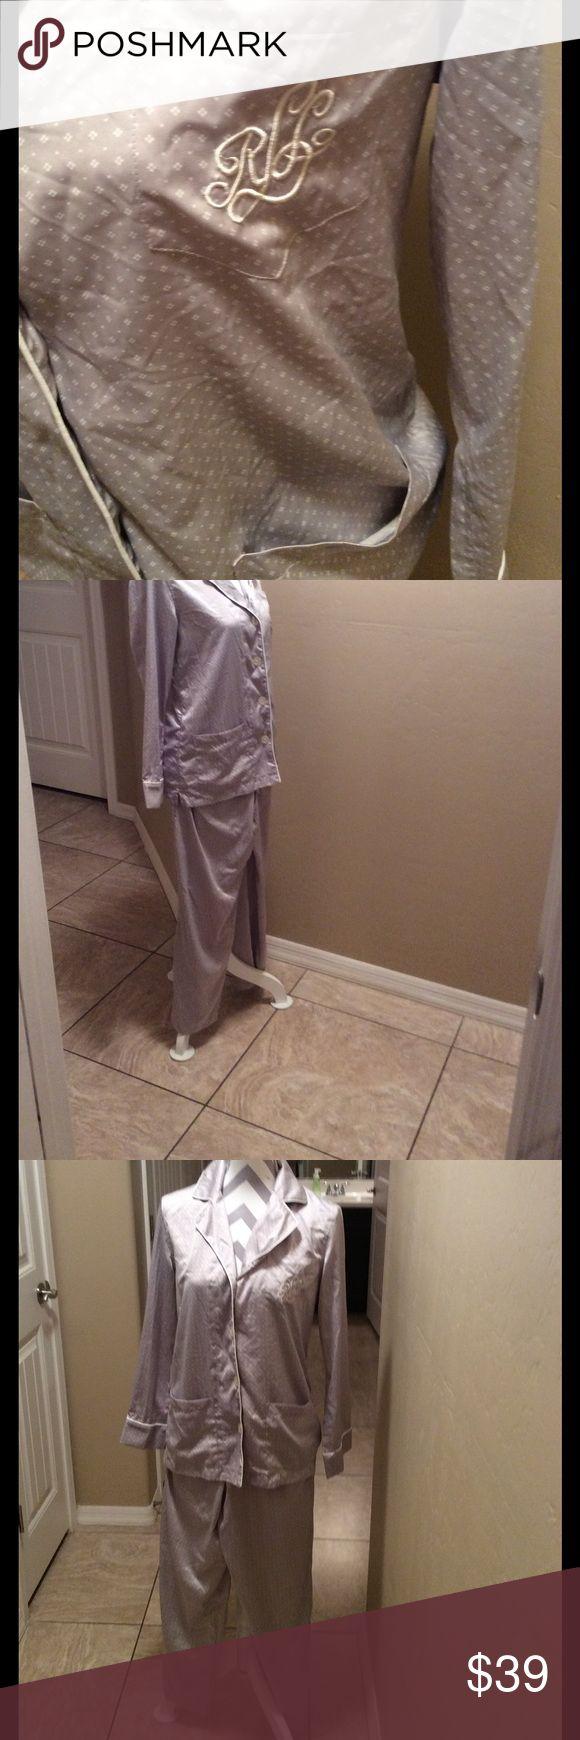 Ralph Lauren. Pajamas size small  light gray Big pockets in front. Size smaii 100 % polyester rauph lauren Intimates & Sleepwear Pajamas